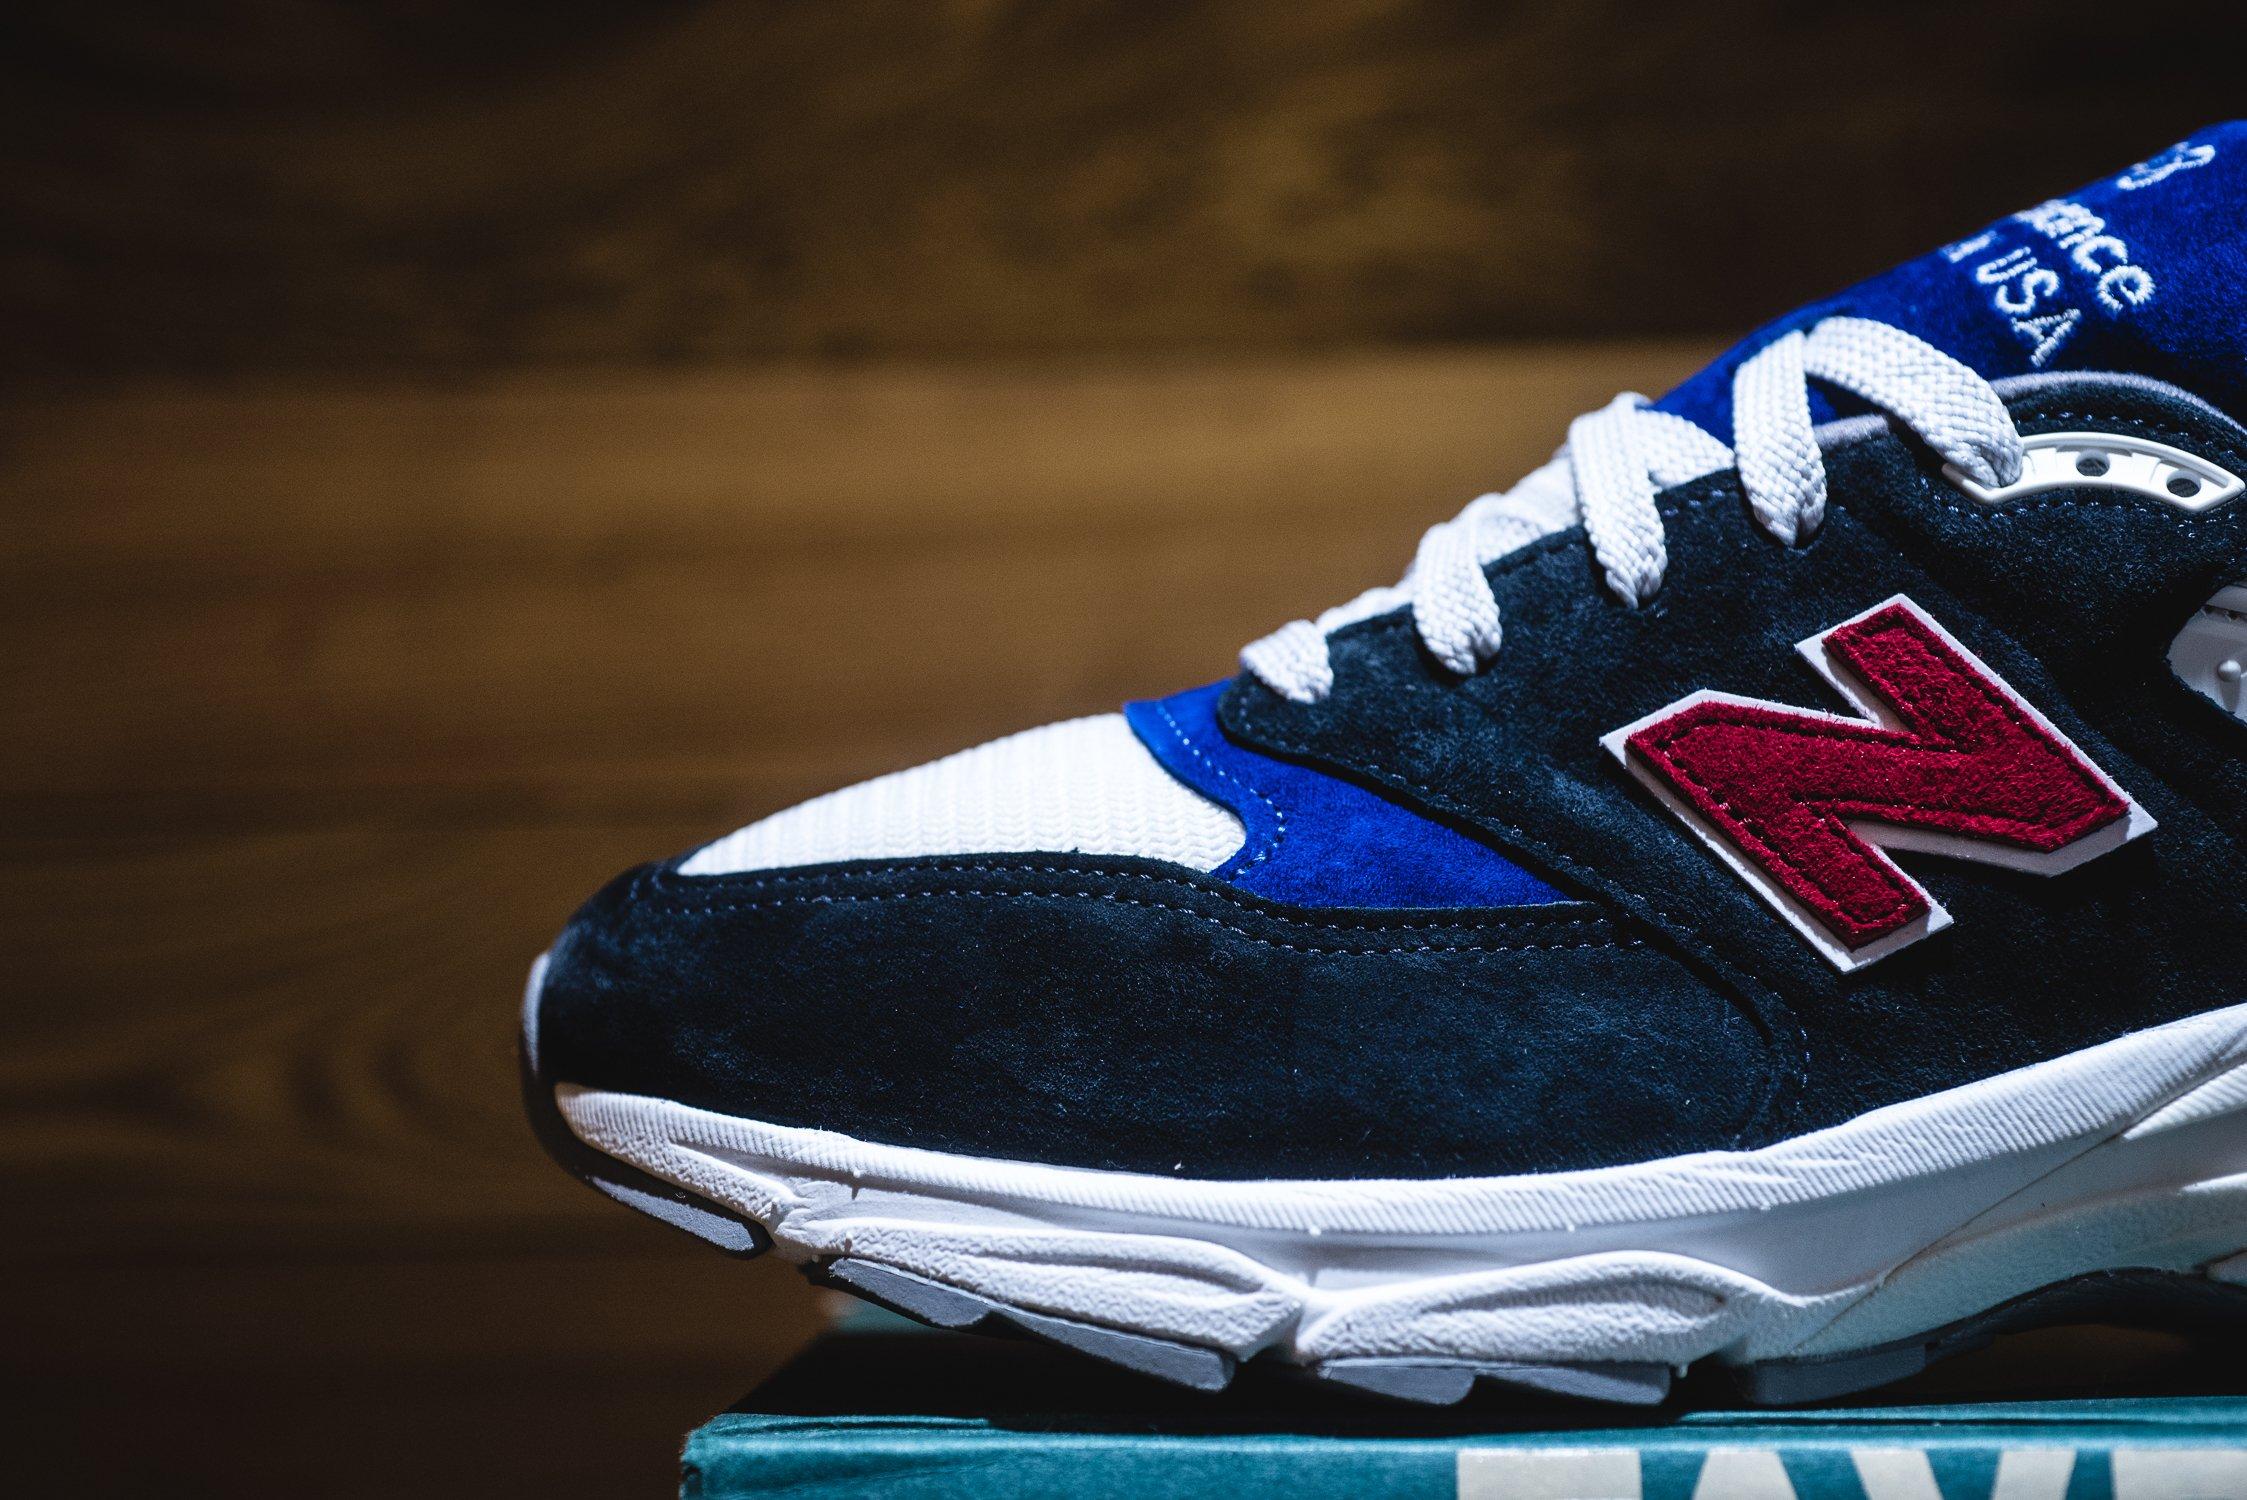 Sneaker_Politics_New_Balance_US998MC1_03.jpg